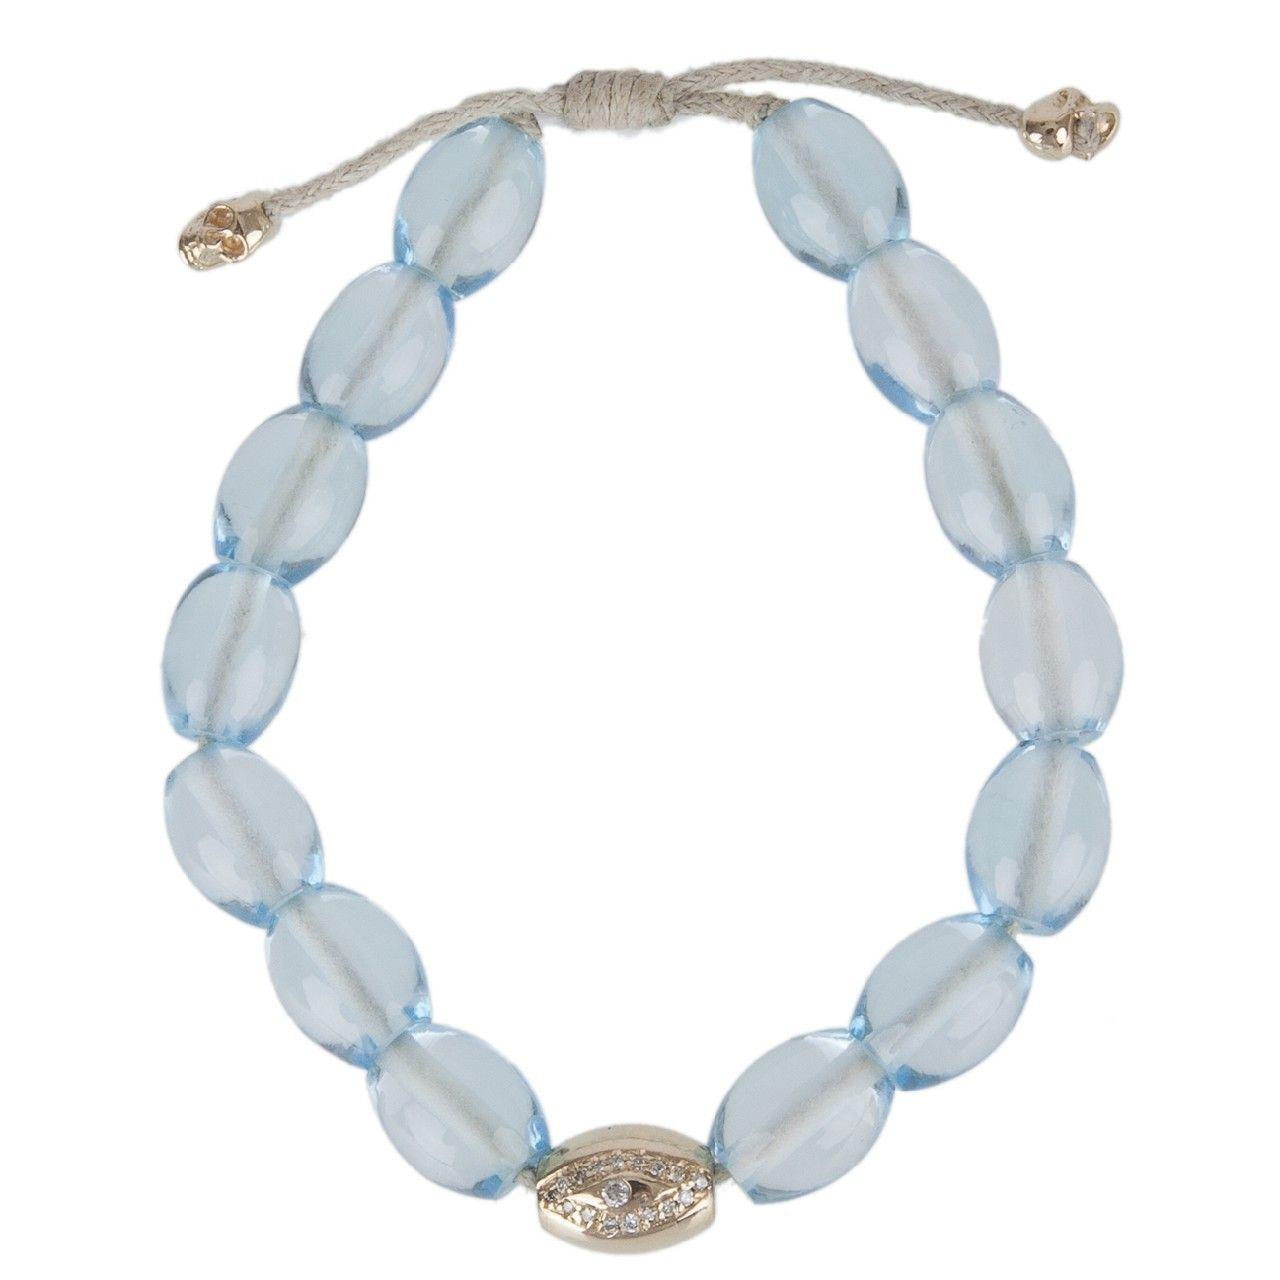 Hirshleifers - Luis Morais  - Eye Drum Bead Bracelet (Smokey Quartz), $1,775.00 (http://www.hirshleifers.com/etc/jewelry/fine-jewelry/bracelets/luis-morais-eye-drum-bead-bracelet-smokey-quartz/)